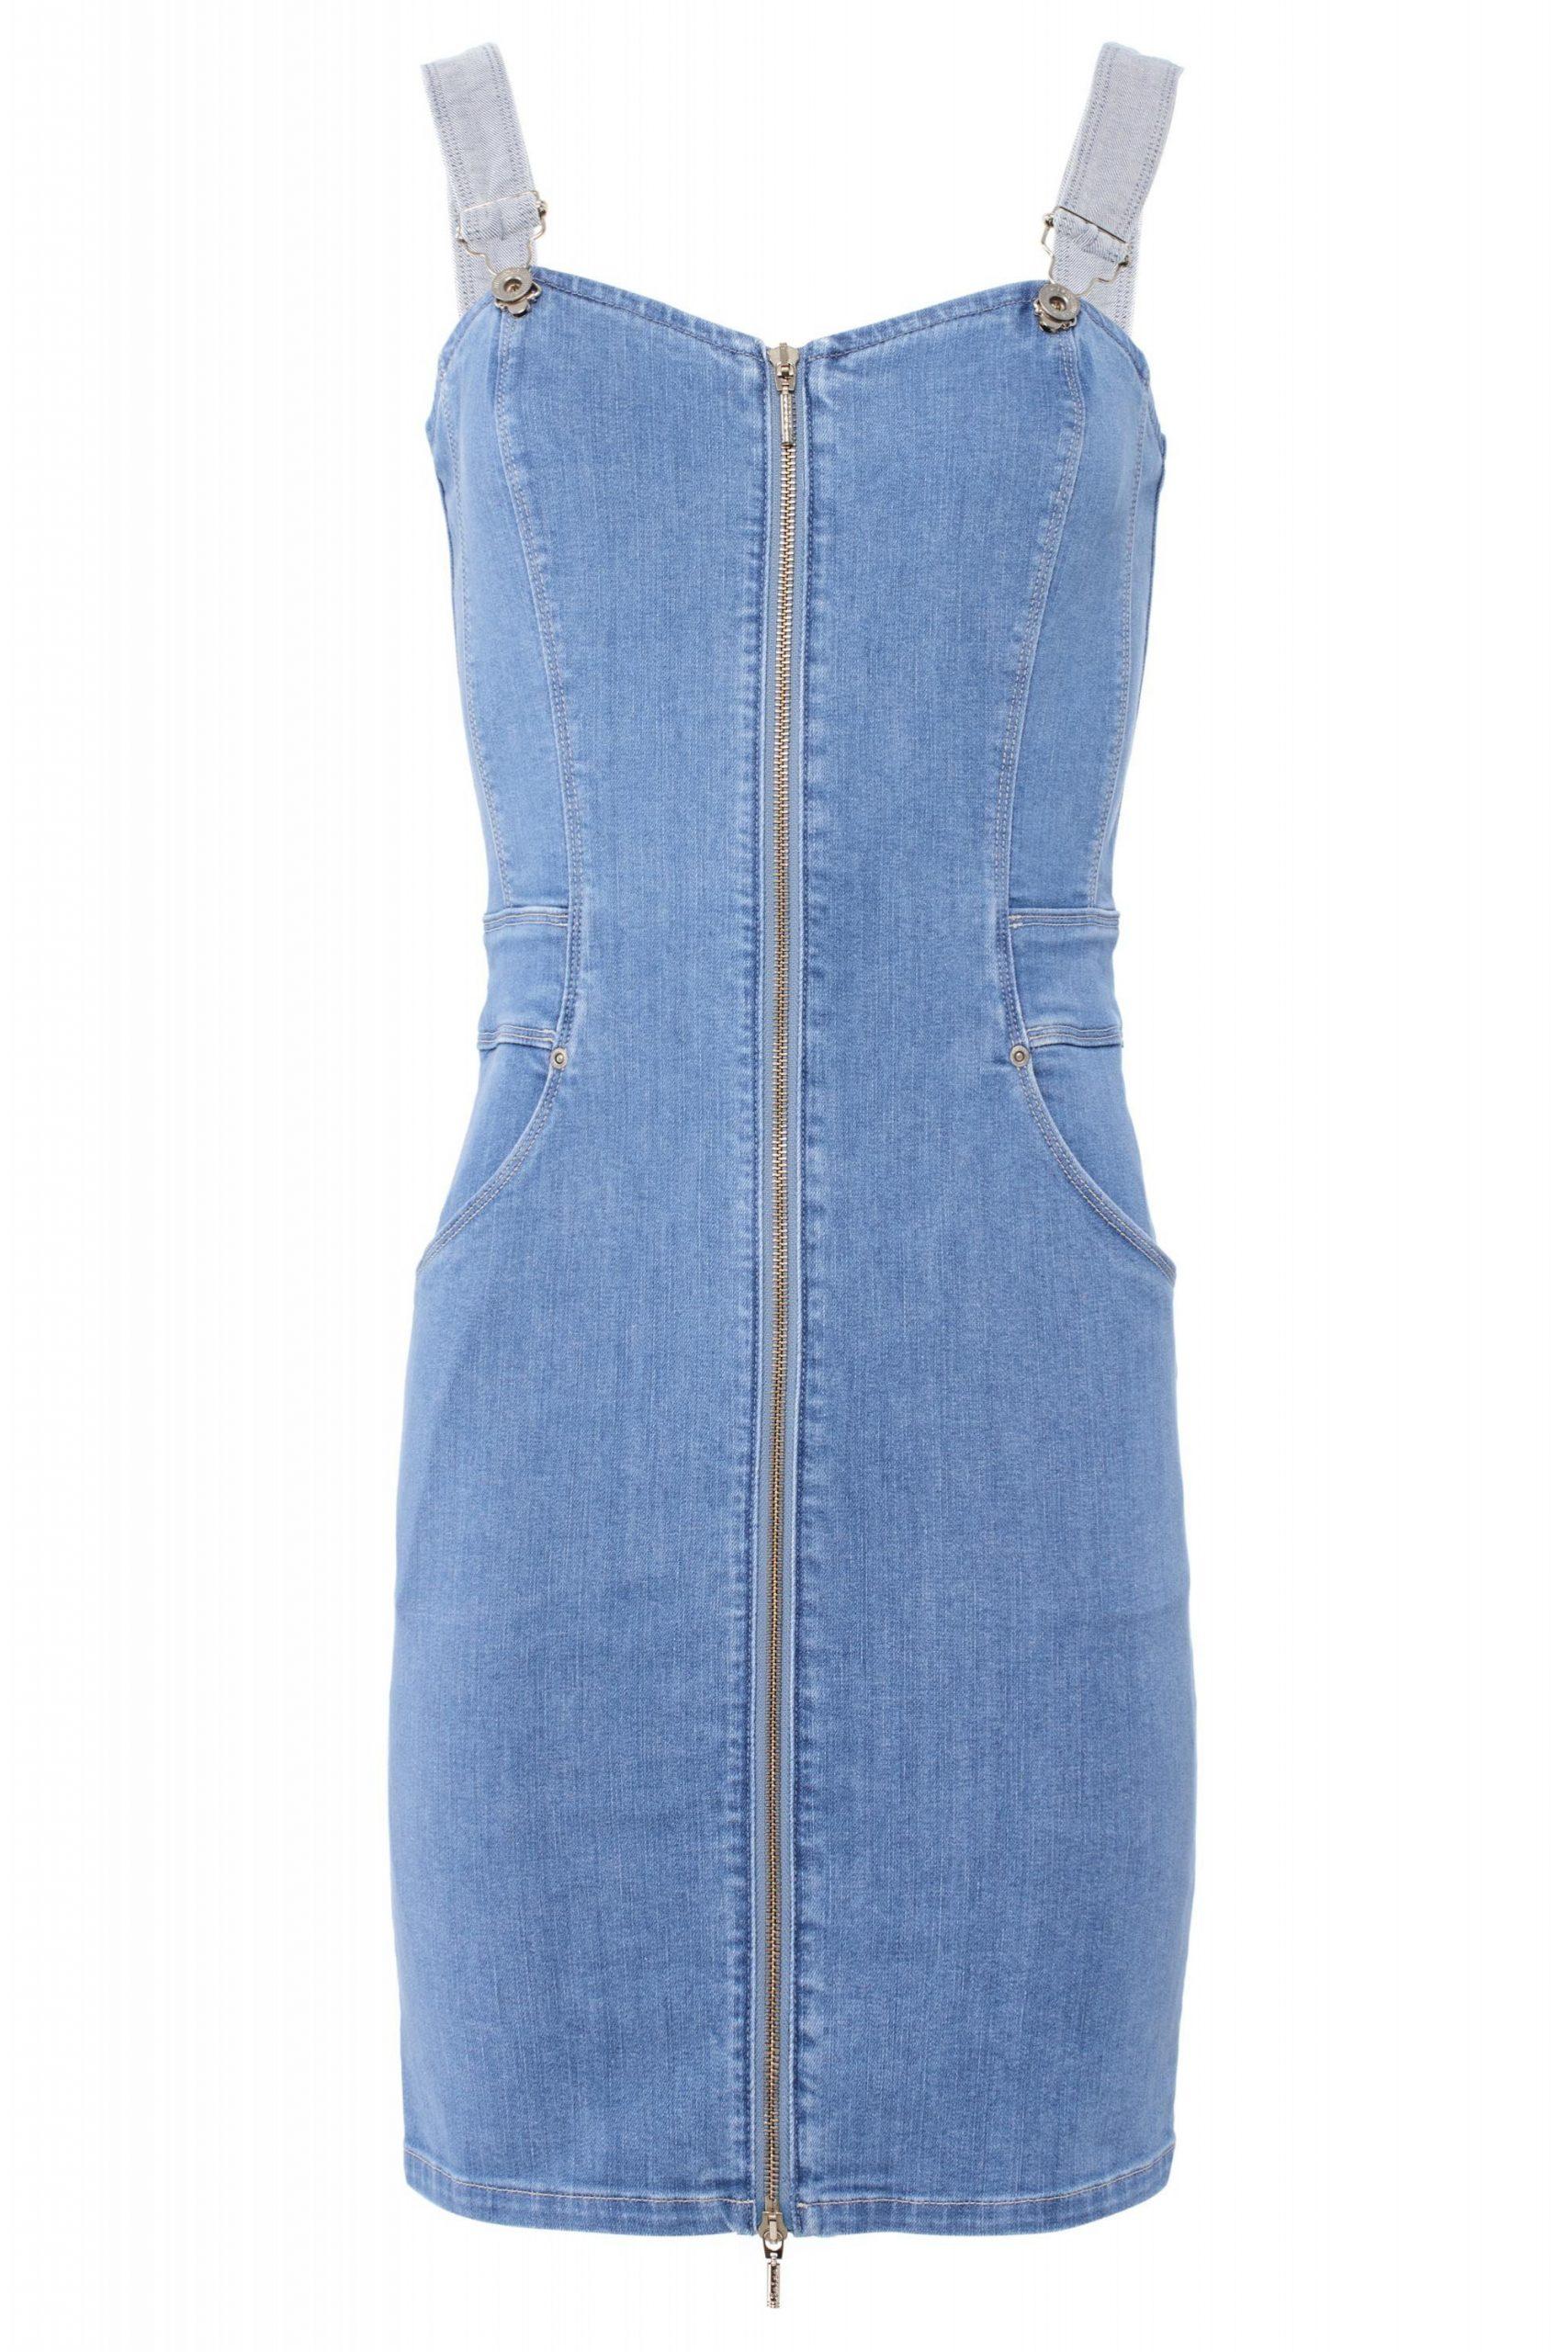 Salsa Jeans Kleid Push Up Mit Zipper Light Blue 123298